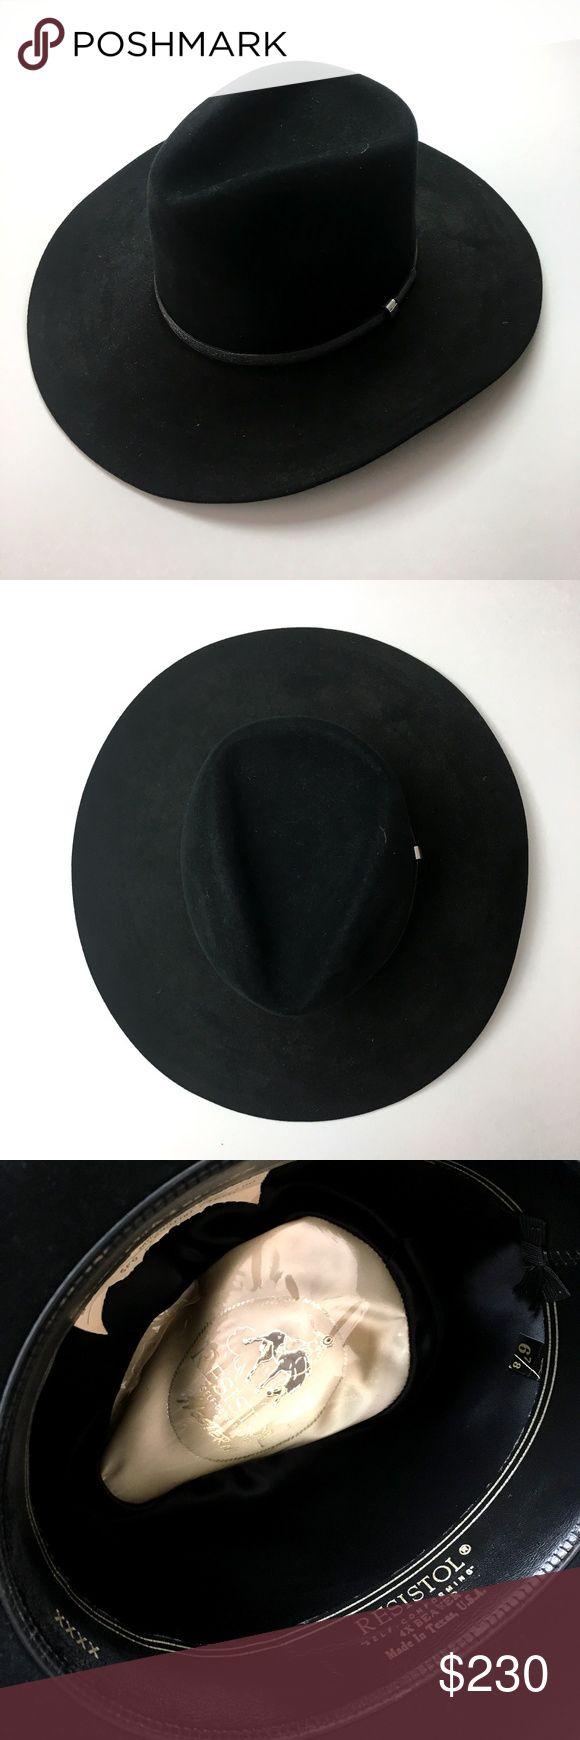 Resistol black cowboy hat sz 6 7/8 Resistol black cowboy hat sz 6 7/8  Made in: USA, texas Size: 6 7/8 Head size (circumference): 21 Materials: beaver, leather colors: black Condition: excellent No Box #CoxyCloset #resistol #beaverhat #cowboy #cowboyhat #authentic #texas #accessories #hat #elegant #menshat Accessories Hats